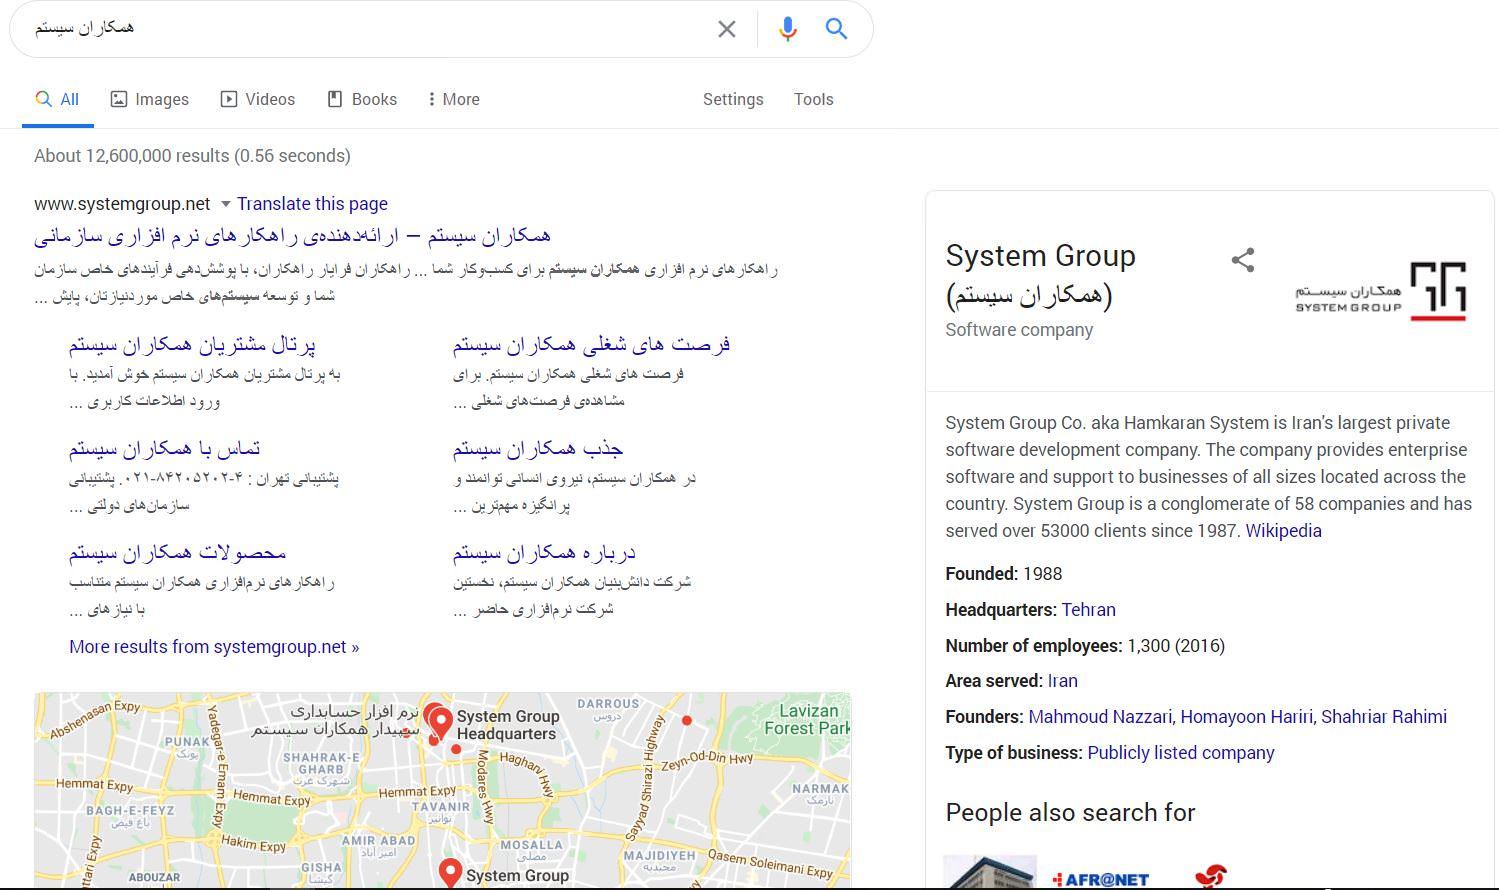 ثبت کسب و کار در گوگل / لوکال سئو / Google My Business